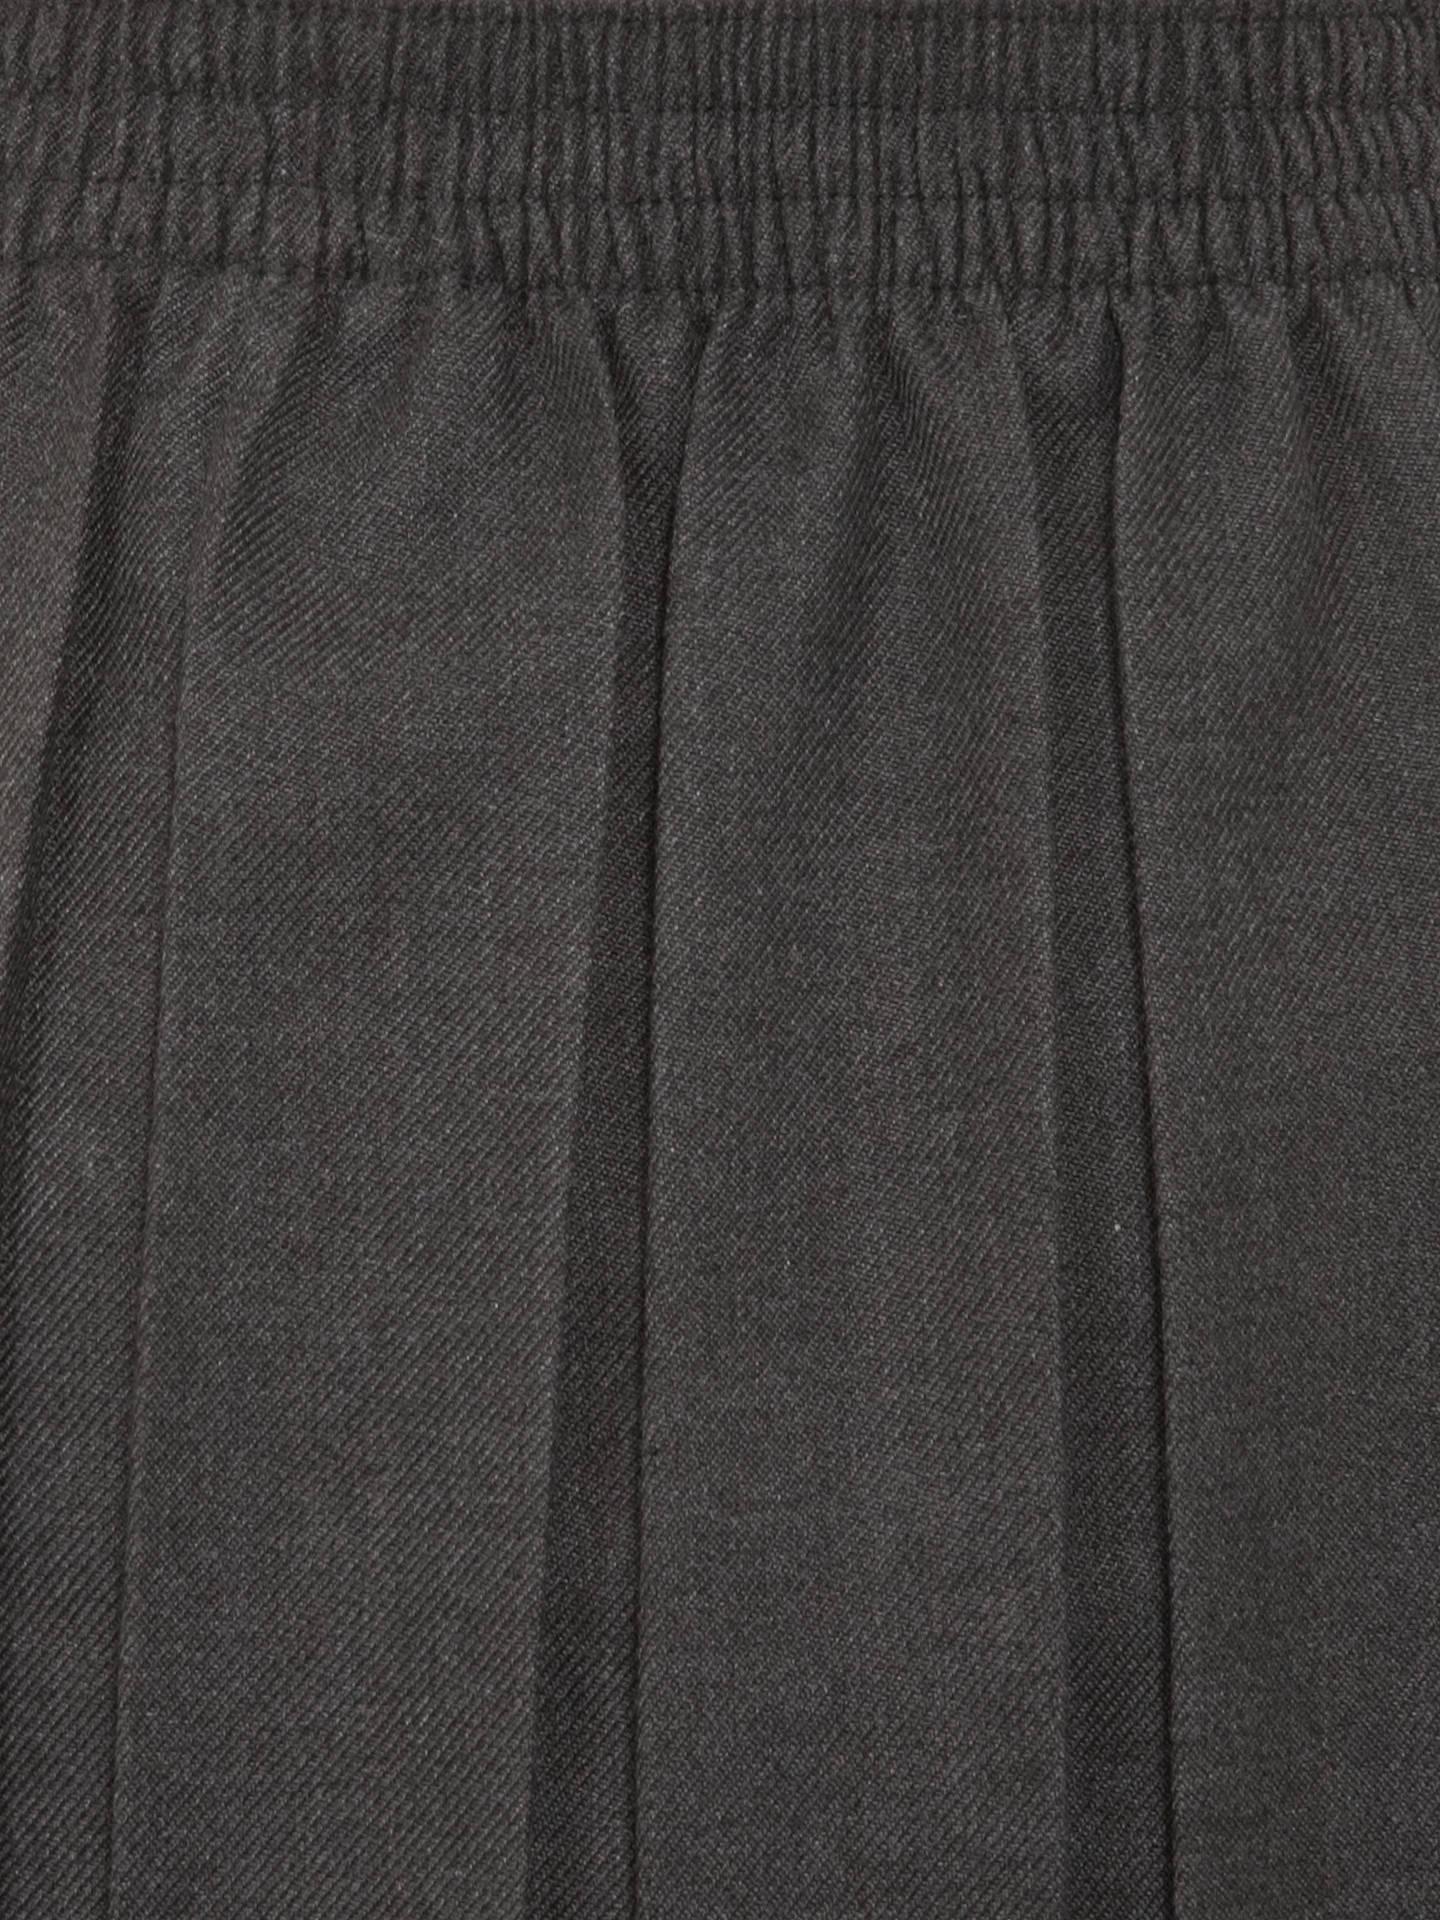 65cb93e66 Grey Box Pleat School Skirt